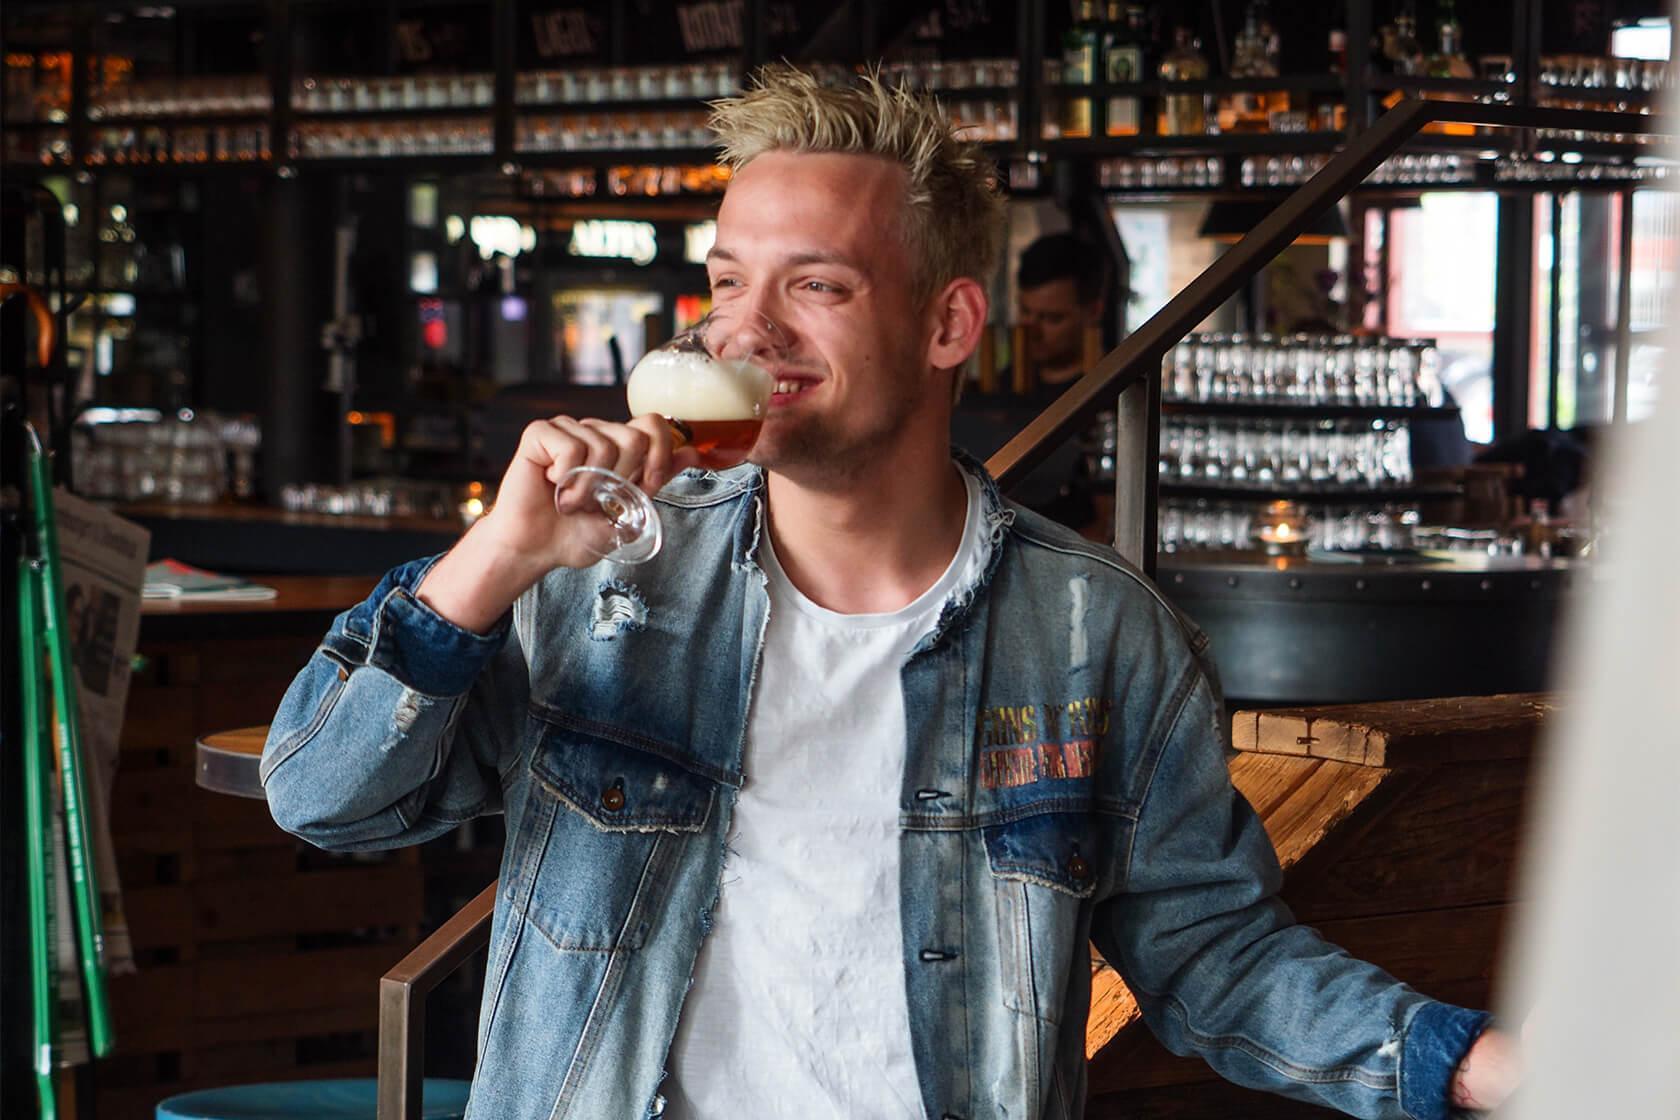 Beerkeeper, Bier trinken, Bier trinken Hamburg, Craft Beer Hamburg